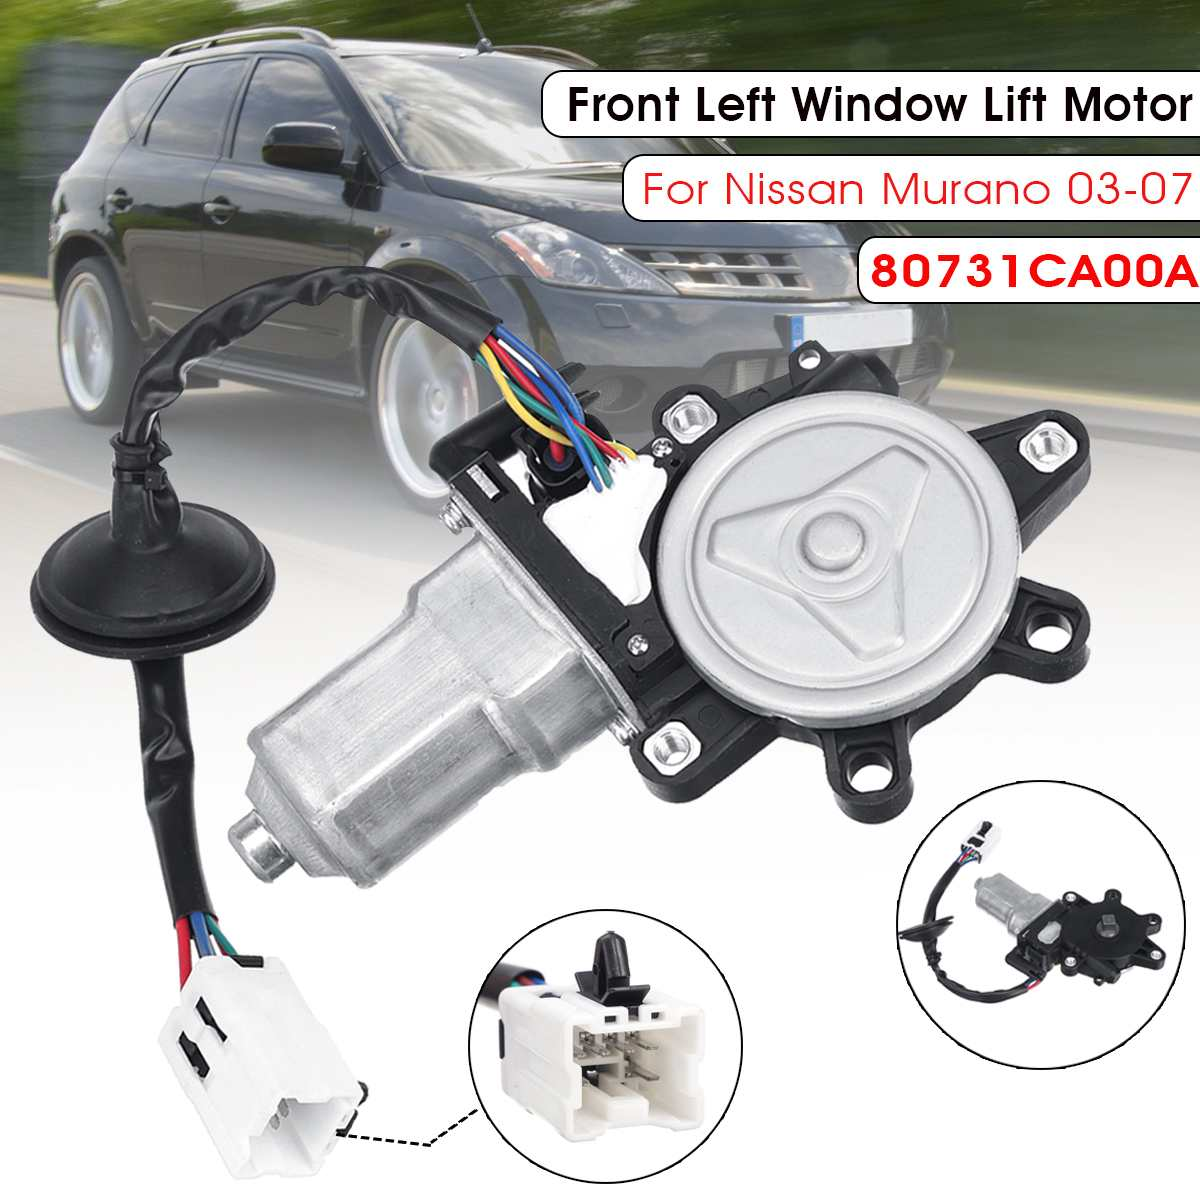 Mitsubishi Outlander 2003-2007 Left Front Power Window Regulator without motor